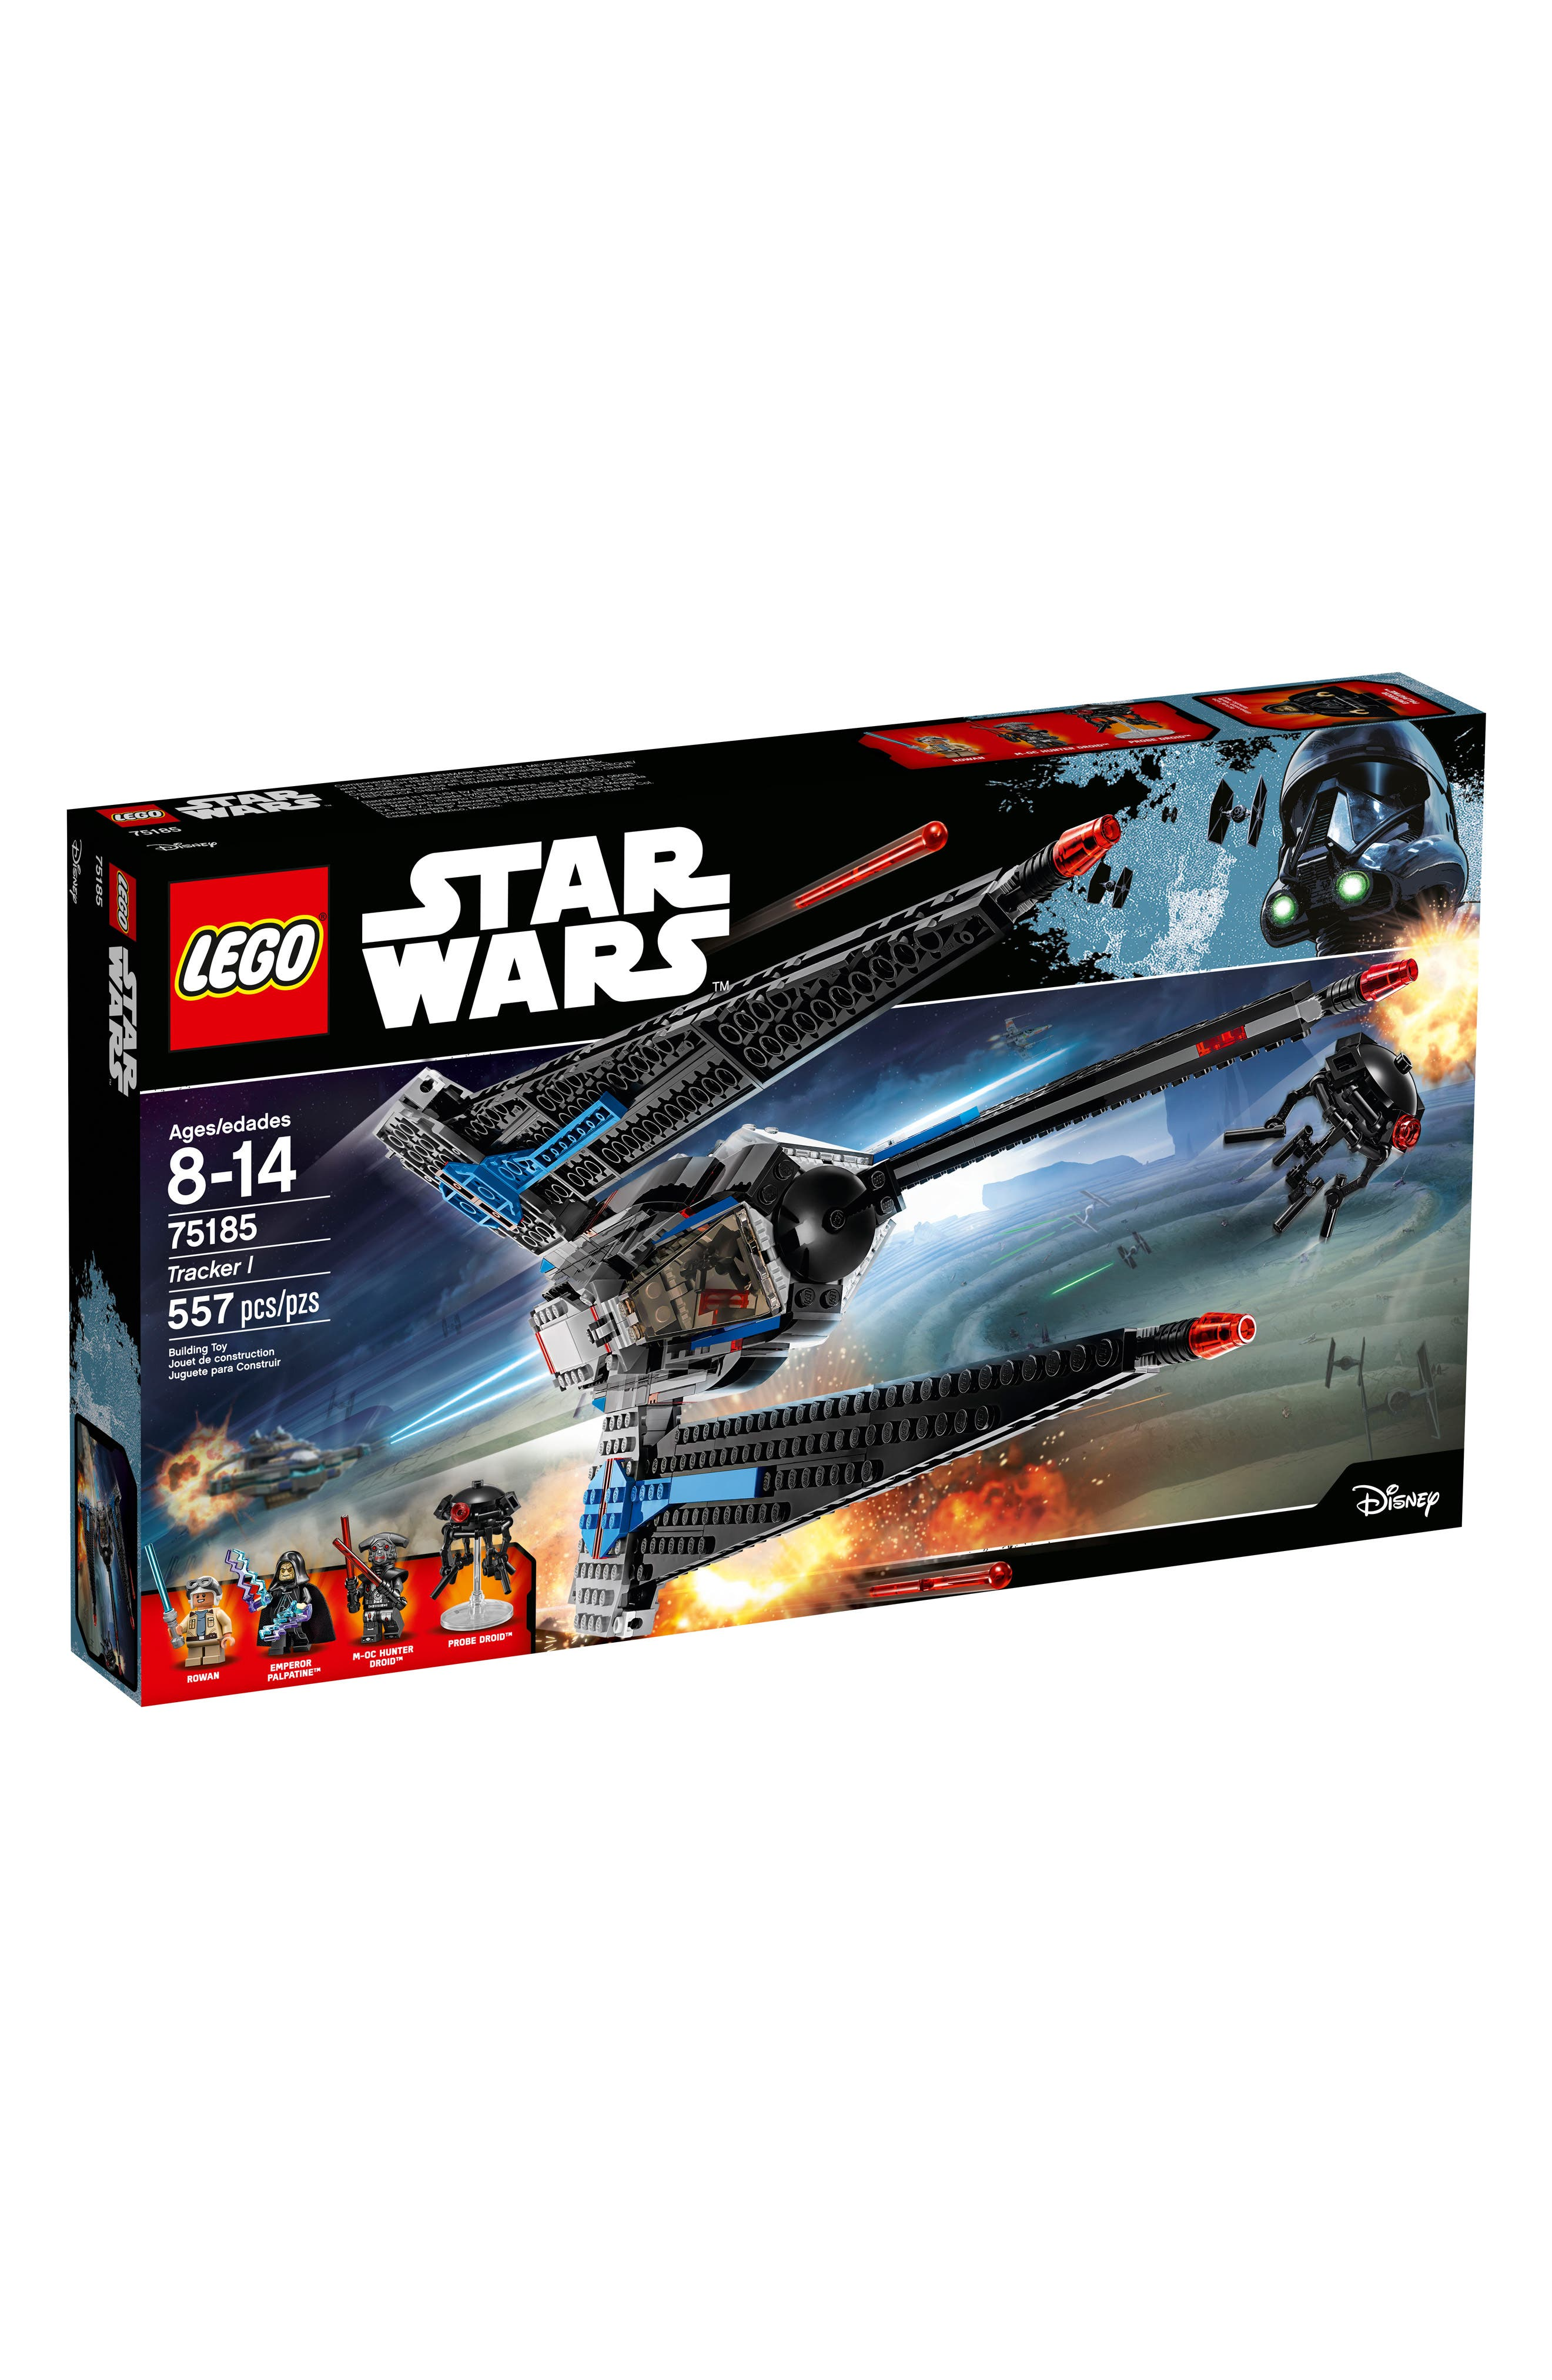 LEGO® Star Wars™: The Freemaker Adventures Tracker I Play Set - 75185